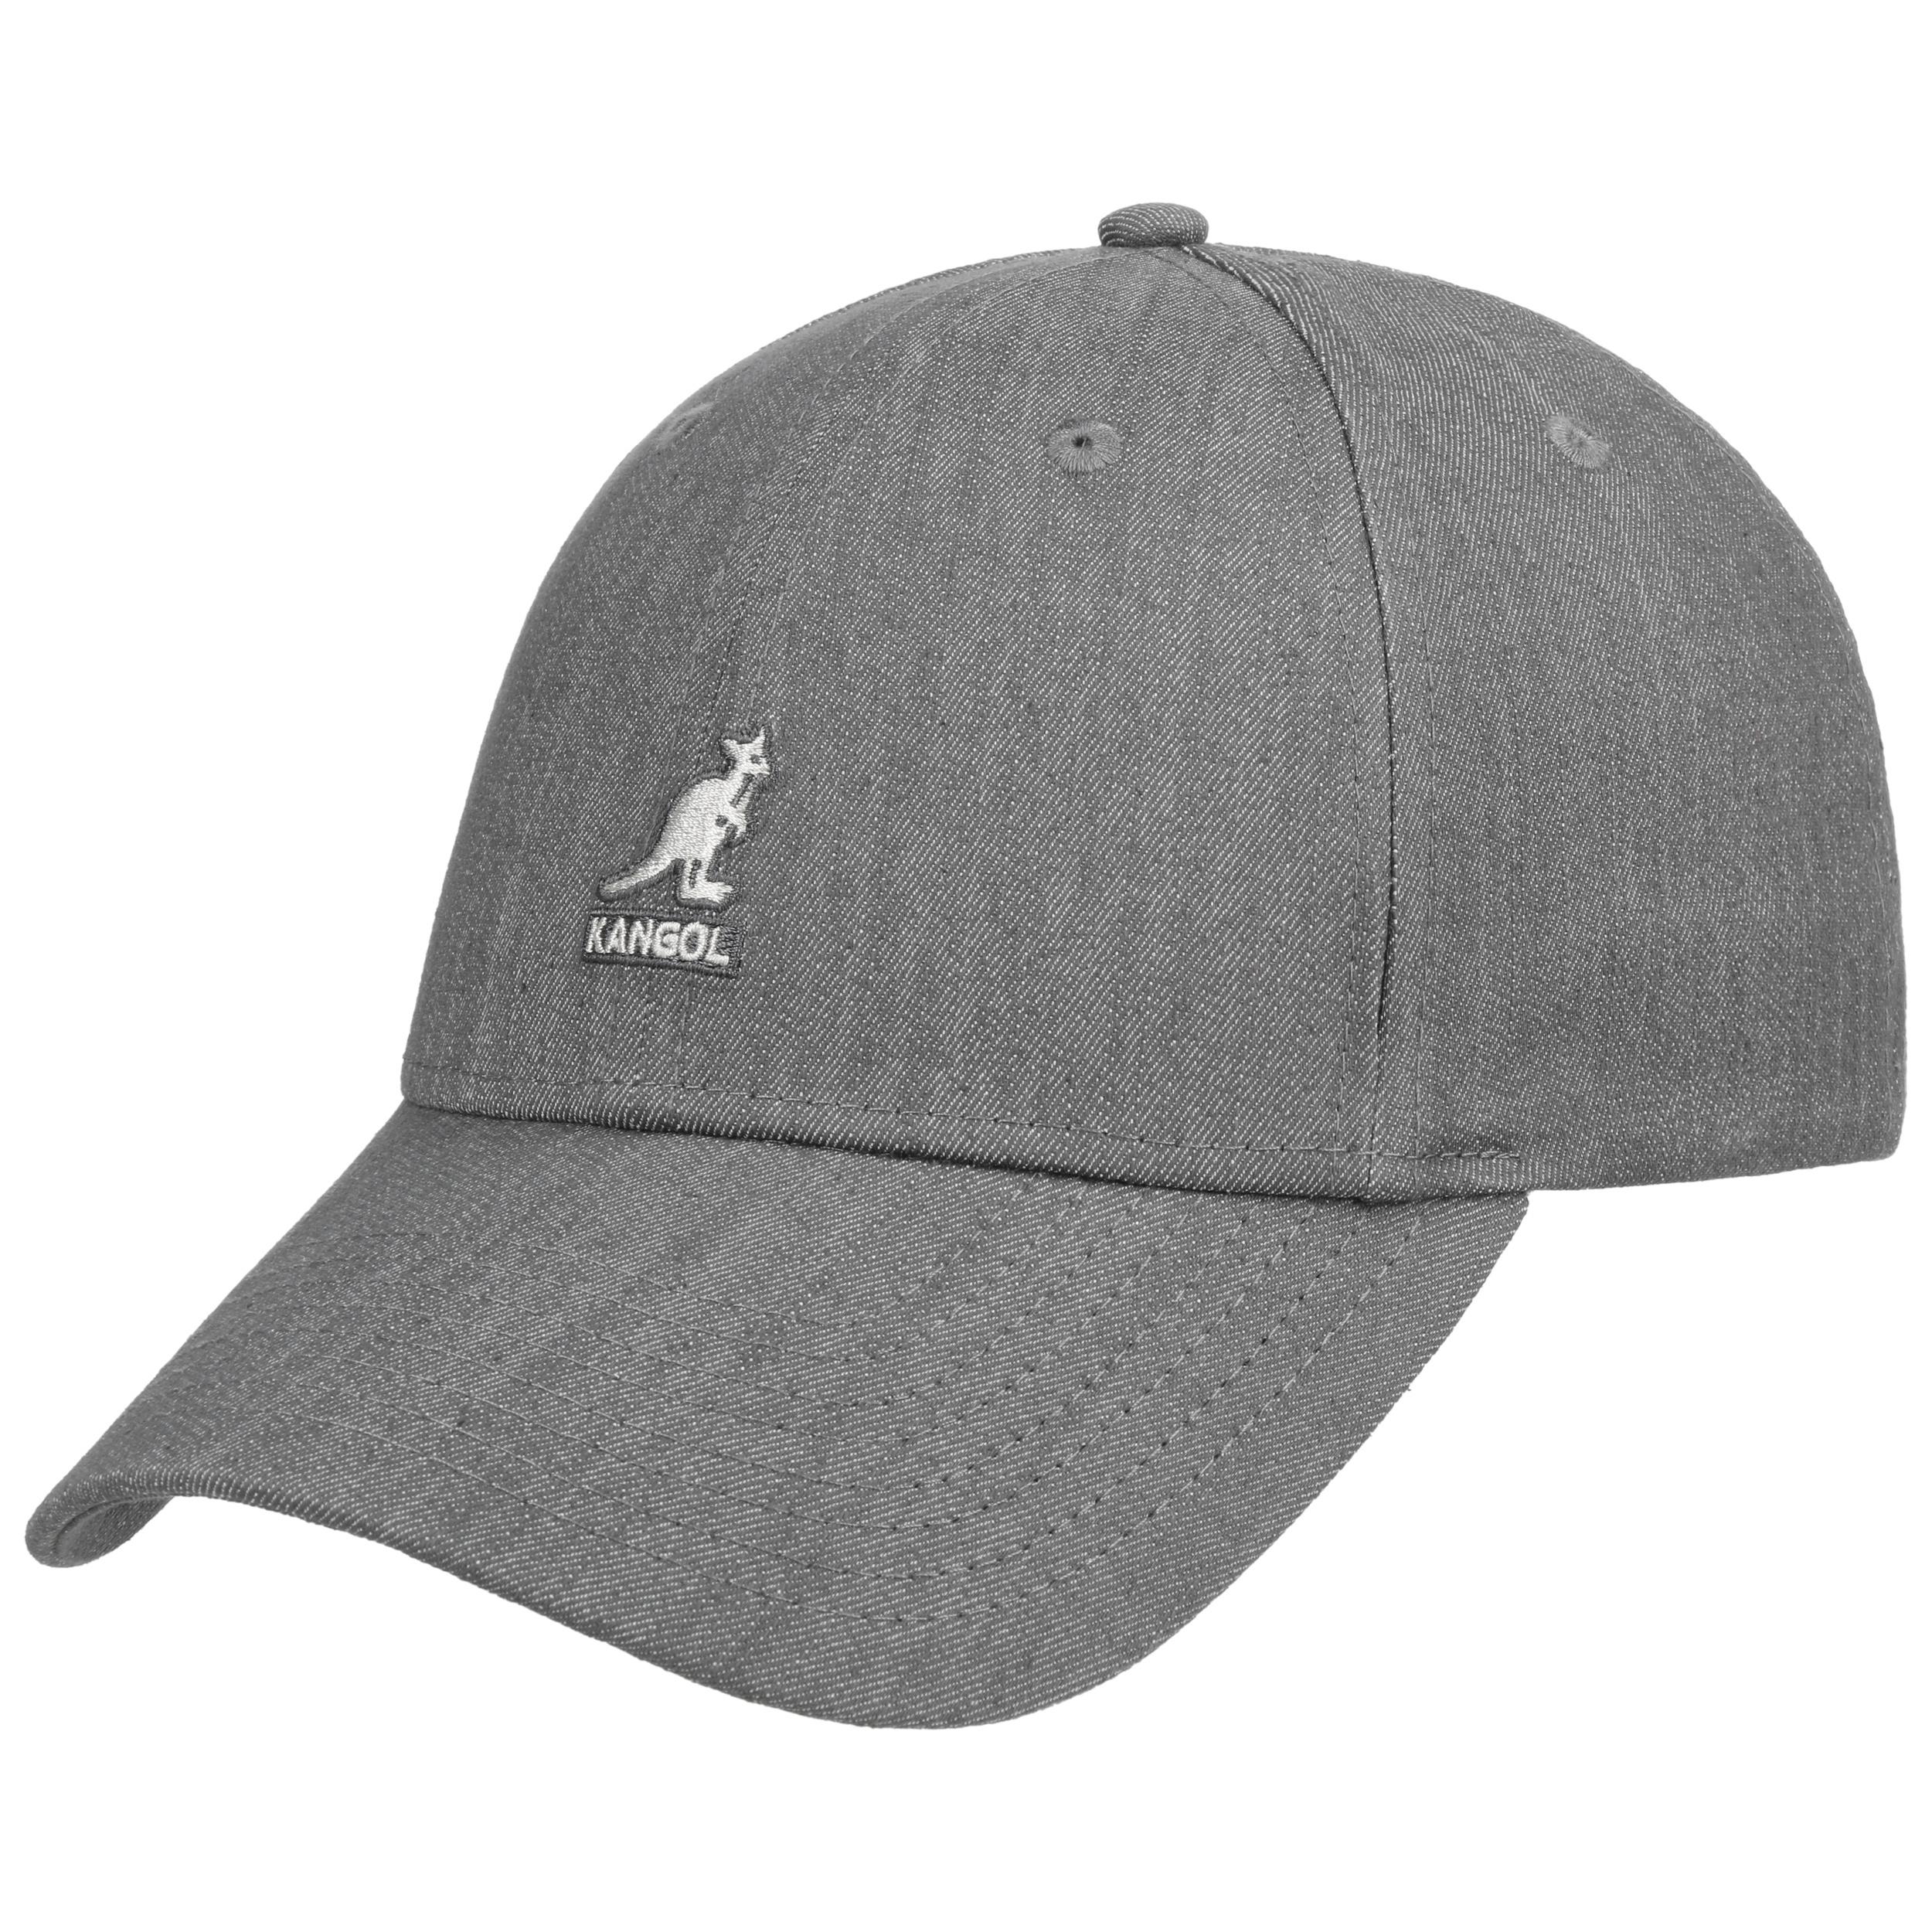 denim flexfit baseball cap by kangol gbp 38 95 hats caps beanies shop online. Black Bedroom Furniture Sets. Home Design Ideas